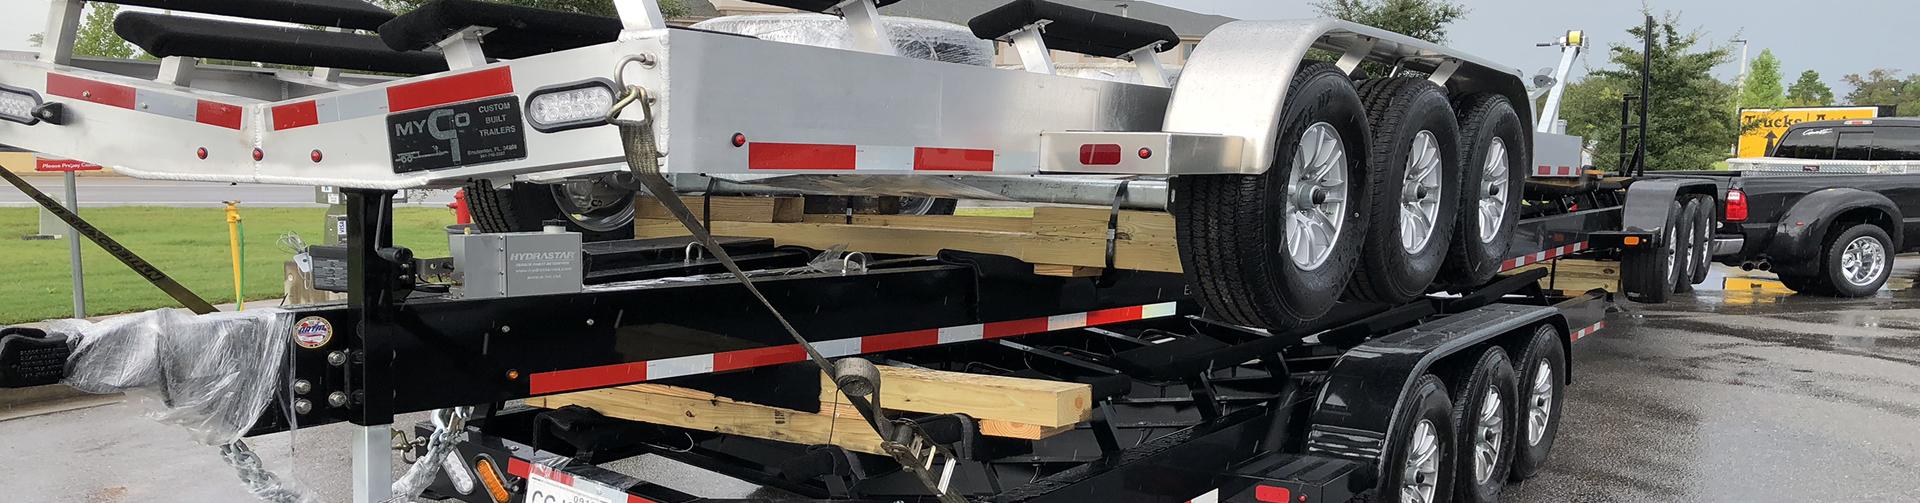 New Jersey Boat Transport